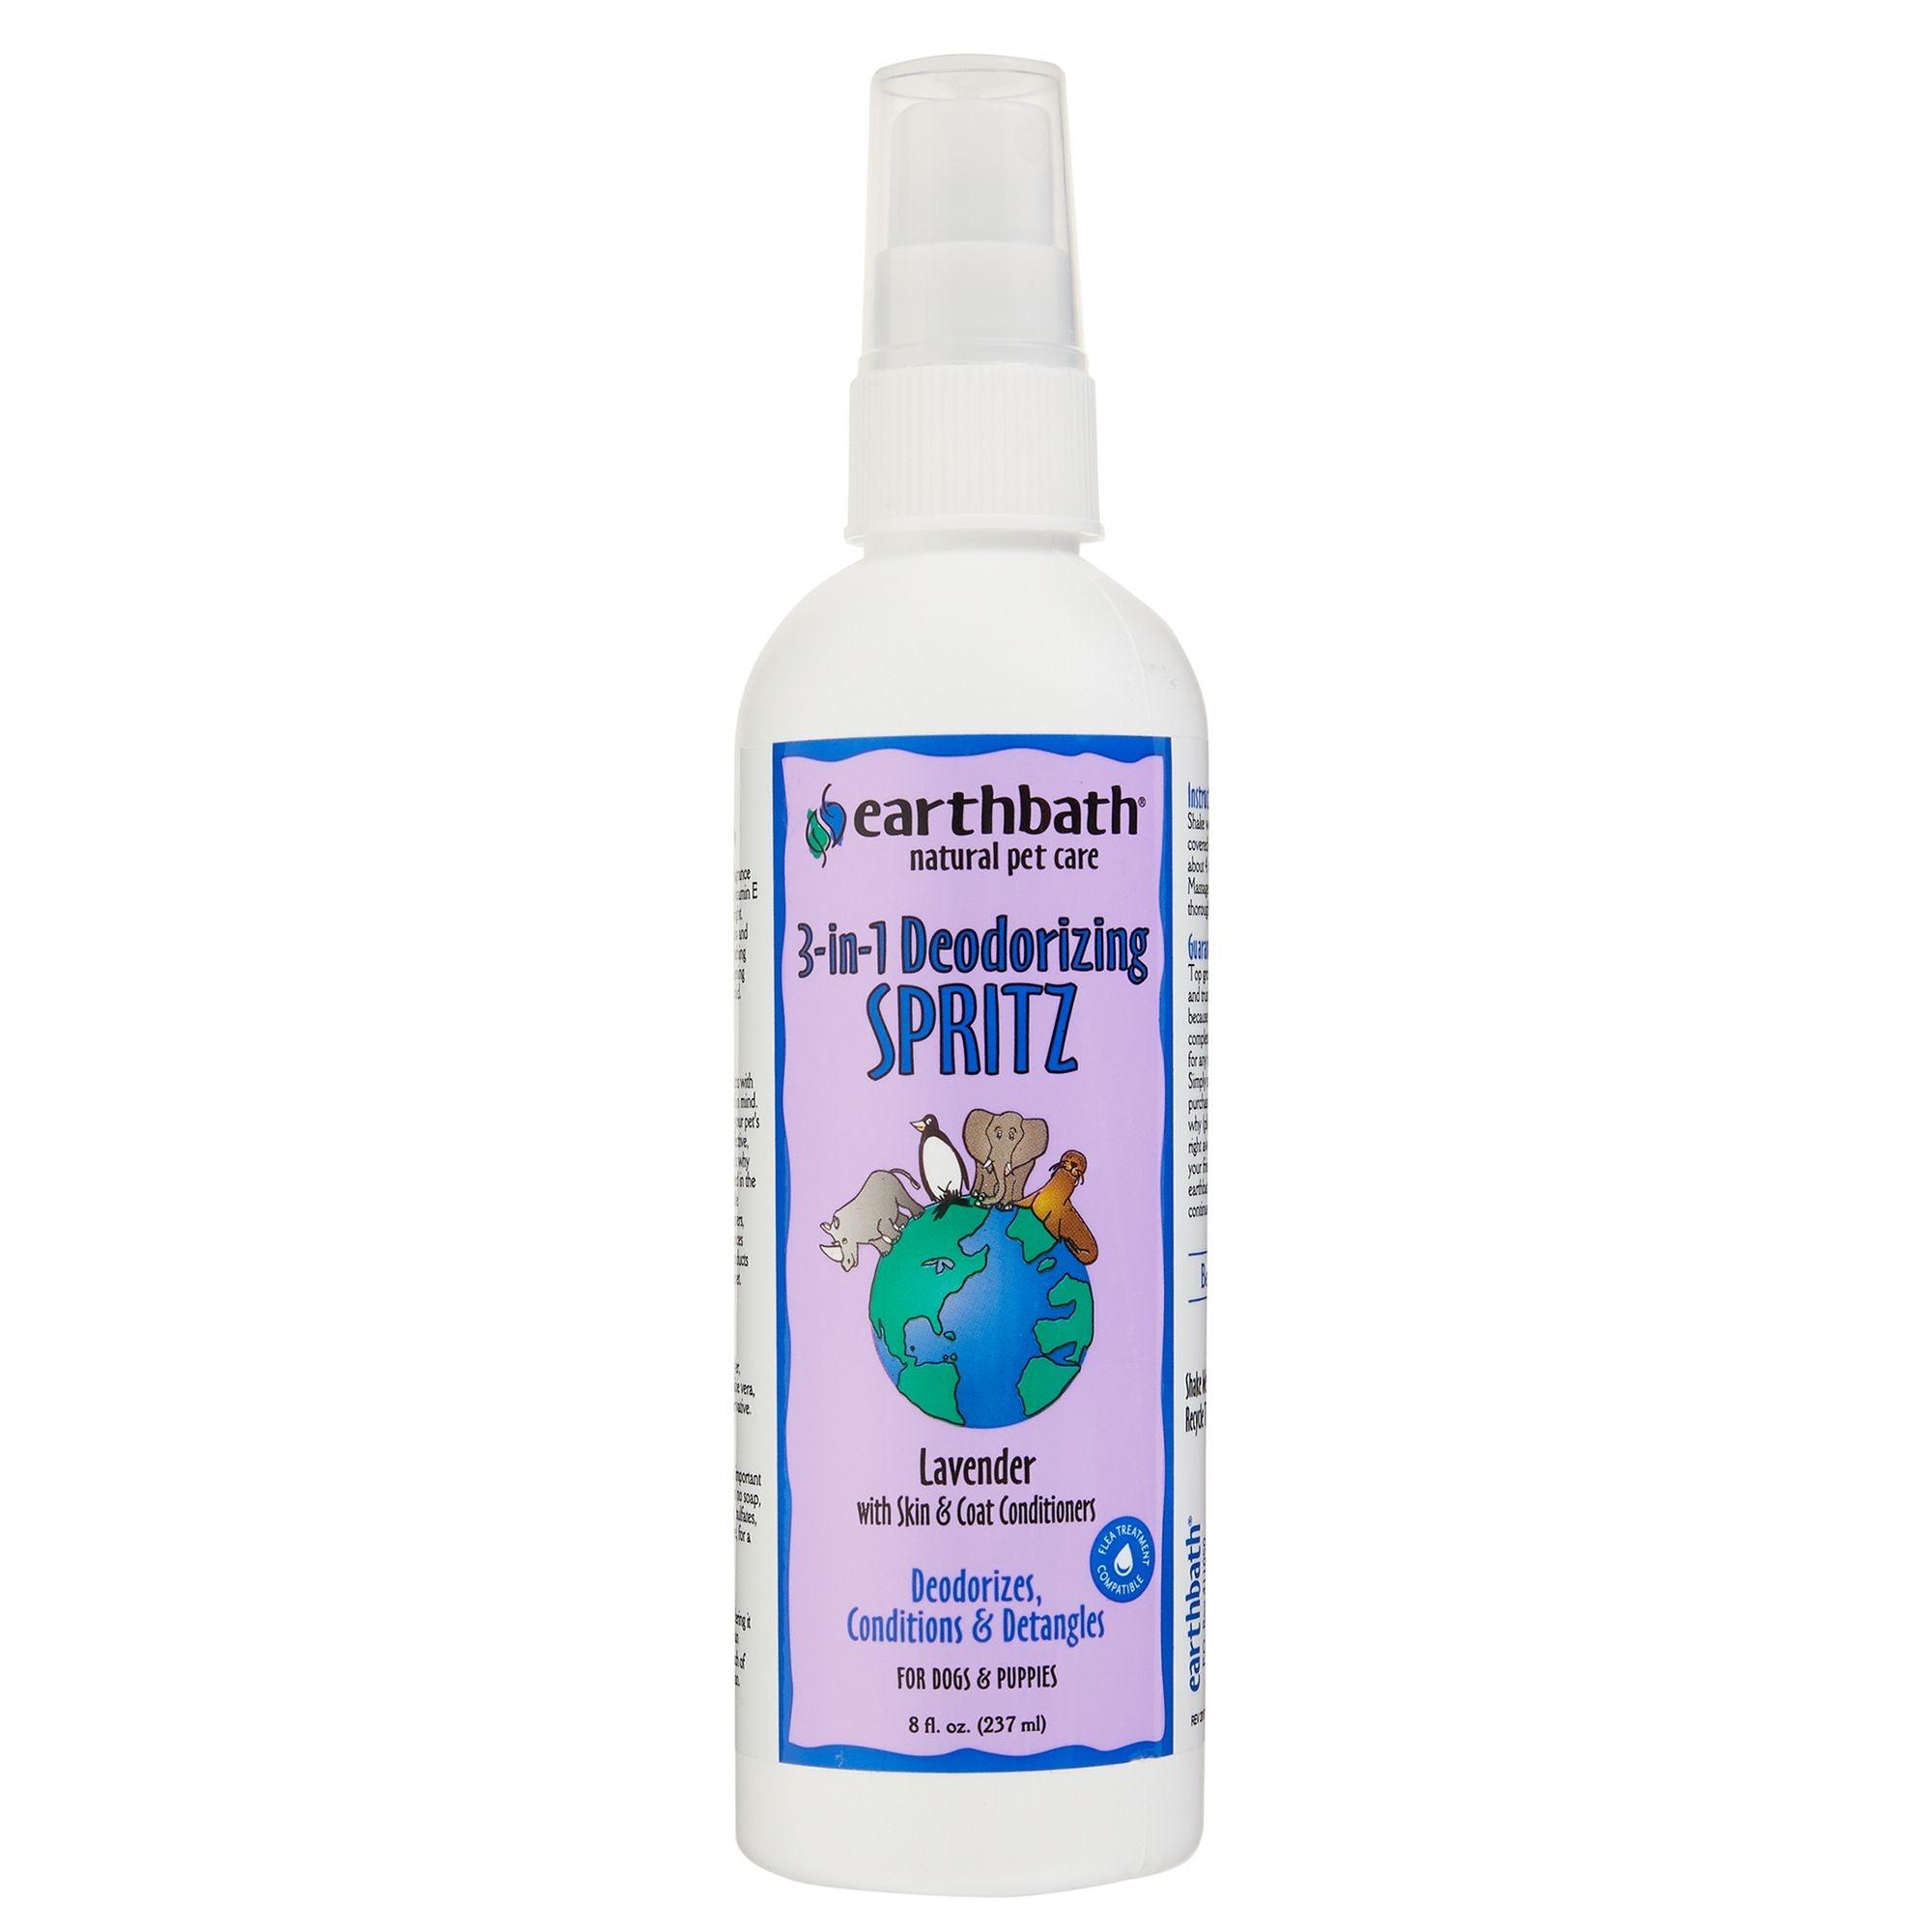 Earthbath Earthbath 3-in-1 Lavender Deodorizing Spritz 8oz